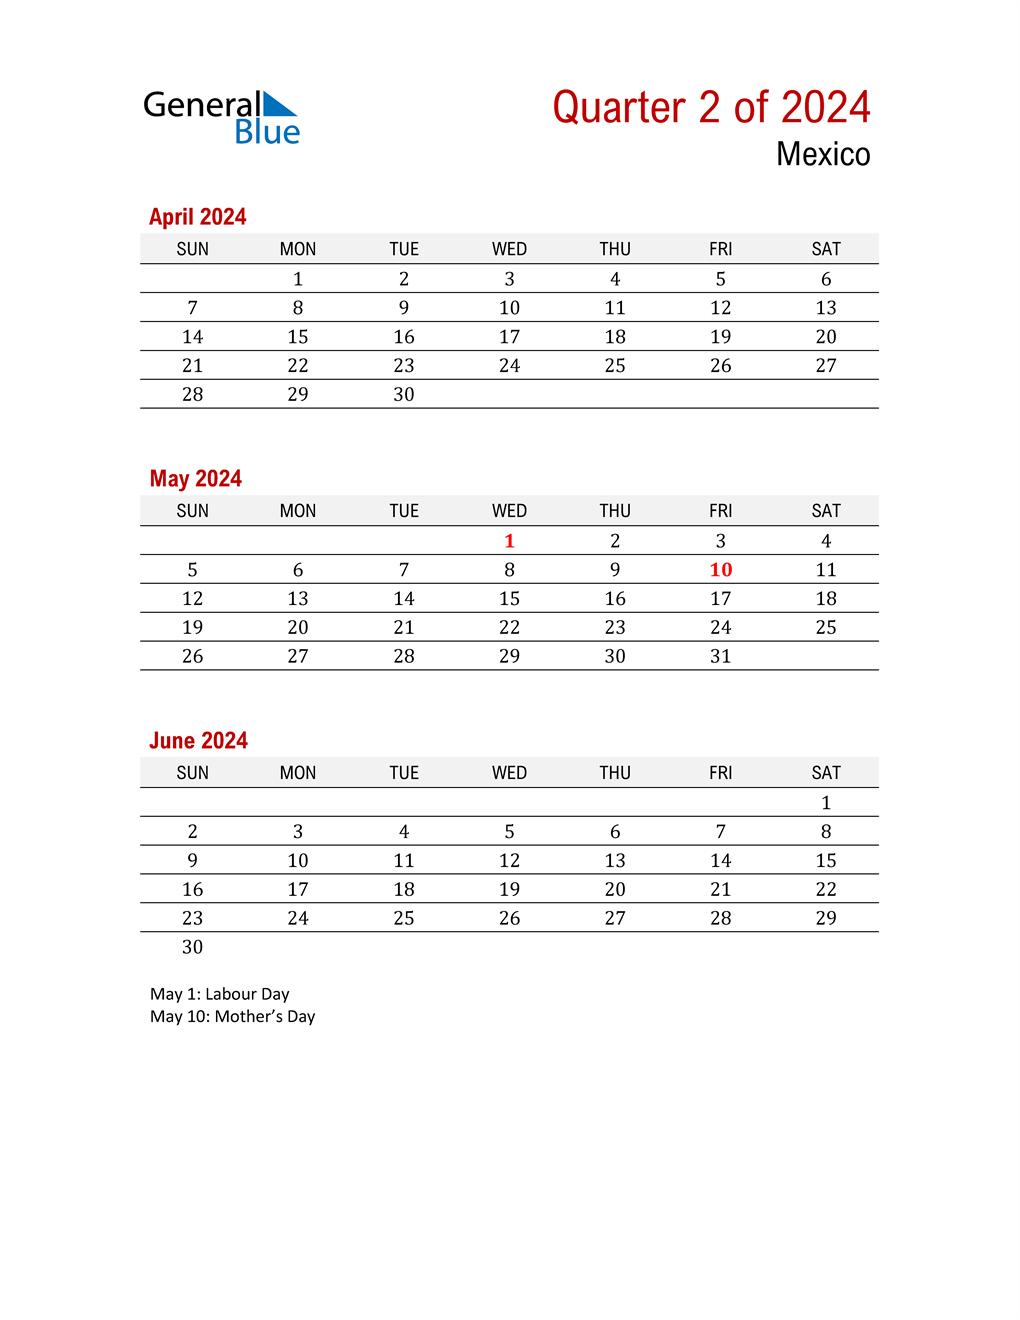 Printable Three Month Calendar for Mexico